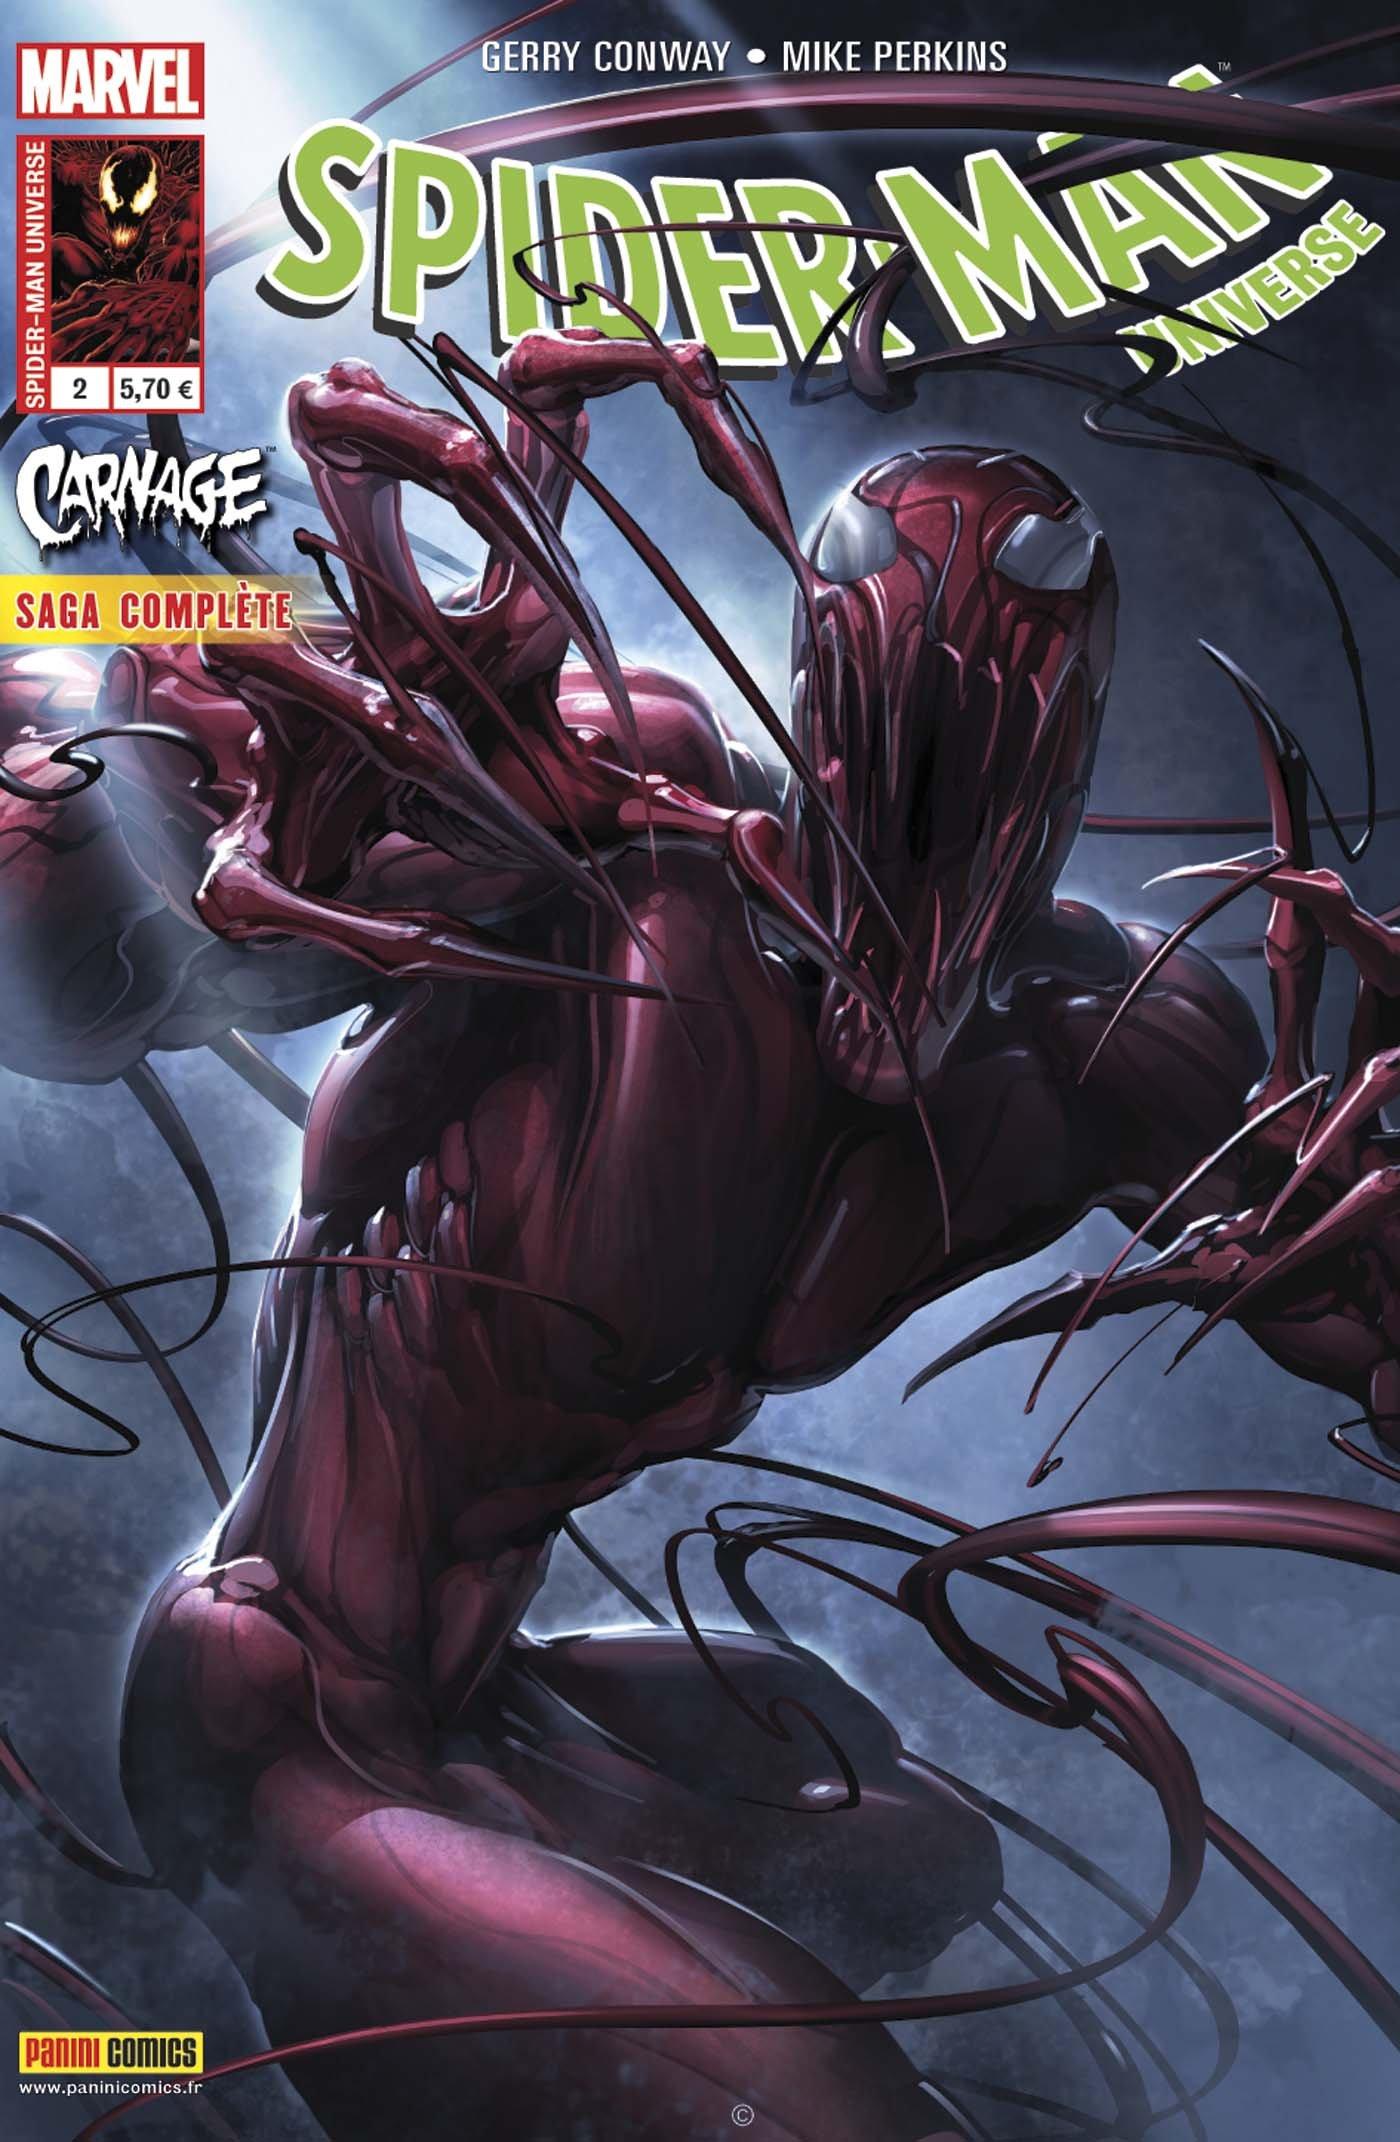 SPIDER-MAN UNIVERSE 2 : CARNAGE